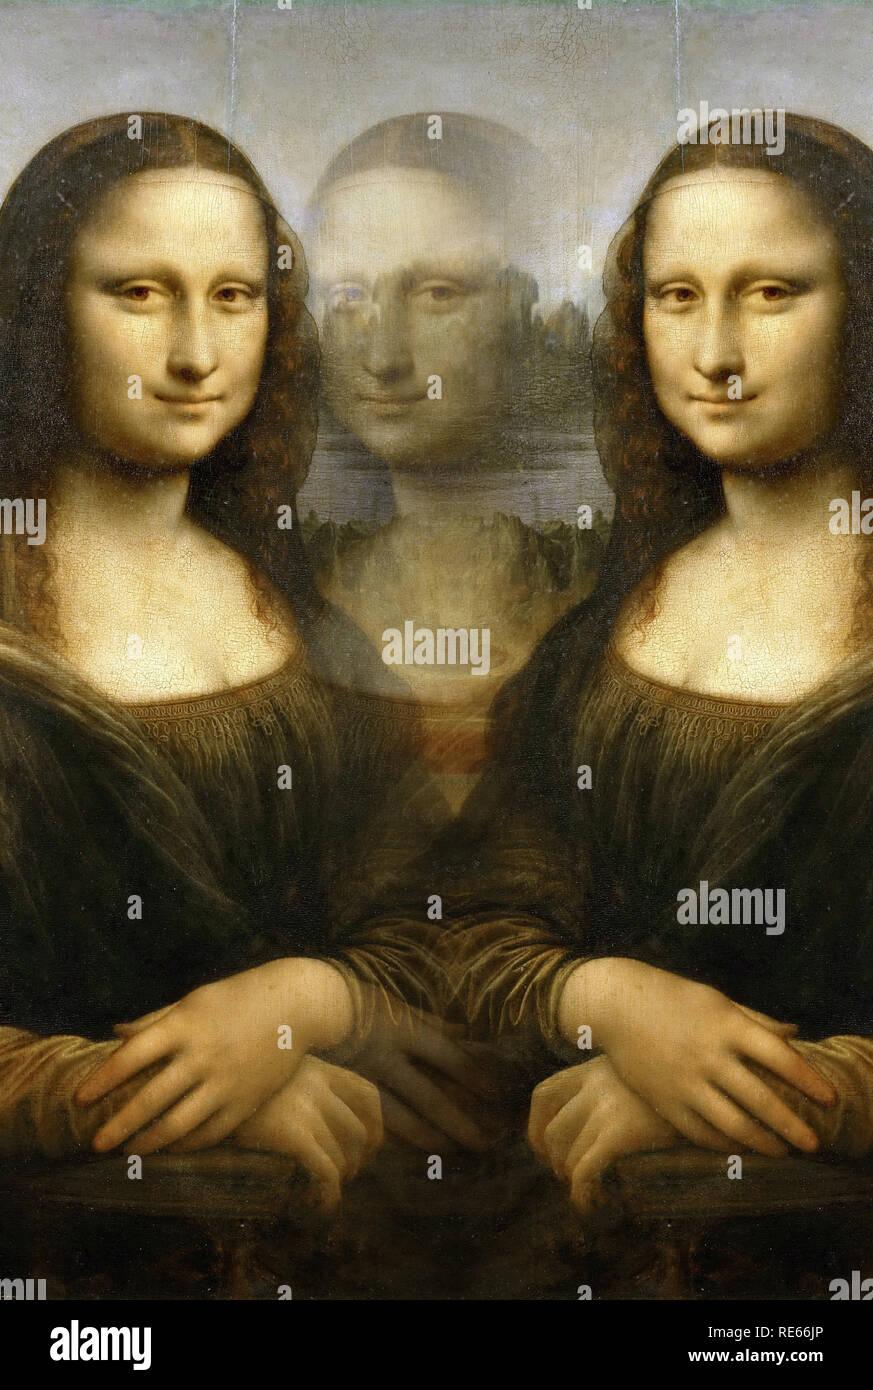 Multiple Mona Lisa of Leonardo, digitally modified - Stock Image